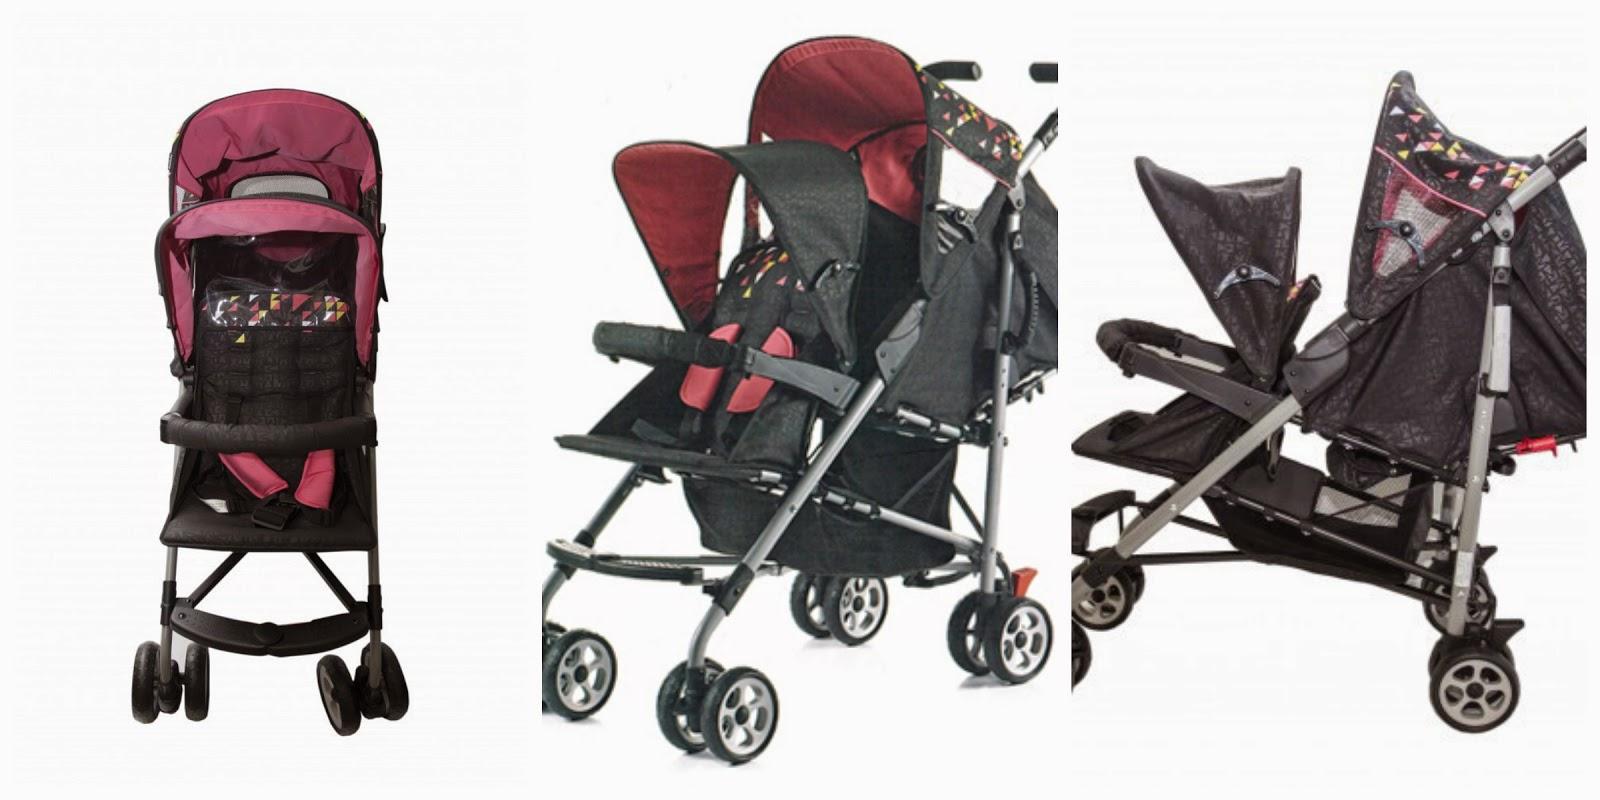 Amy Sweety Store Goodbaby Twin Stroller